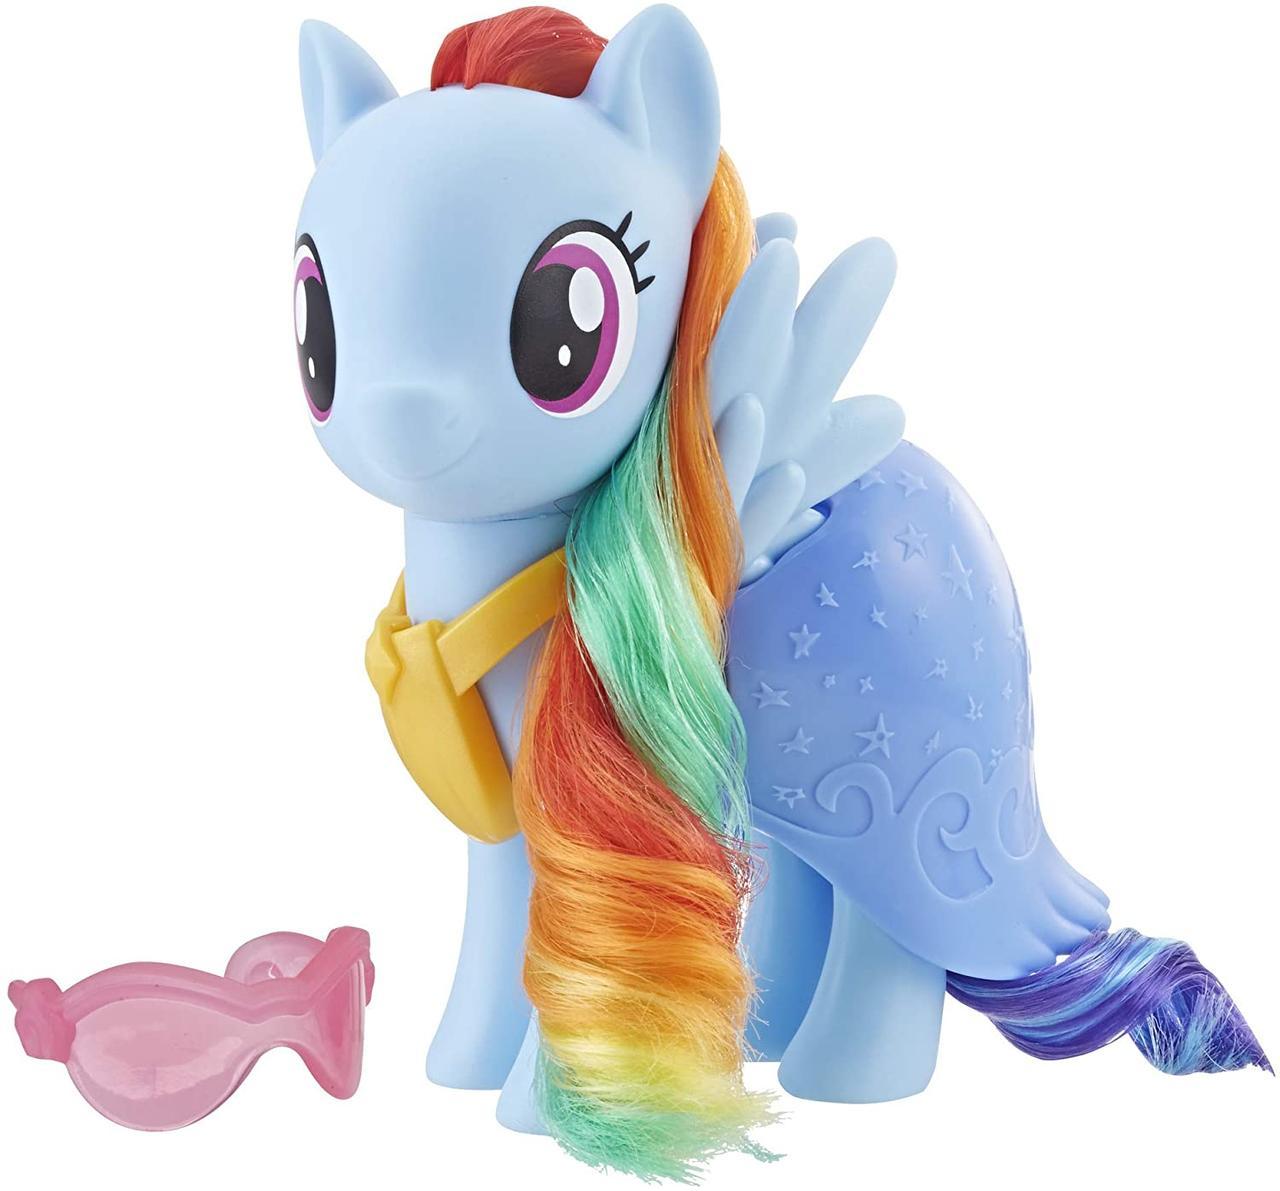 My Little Pony Райдуга Мосту Деш у святковому вбранні E5610 E5551 Dress Up Friendship Rainbow Dash